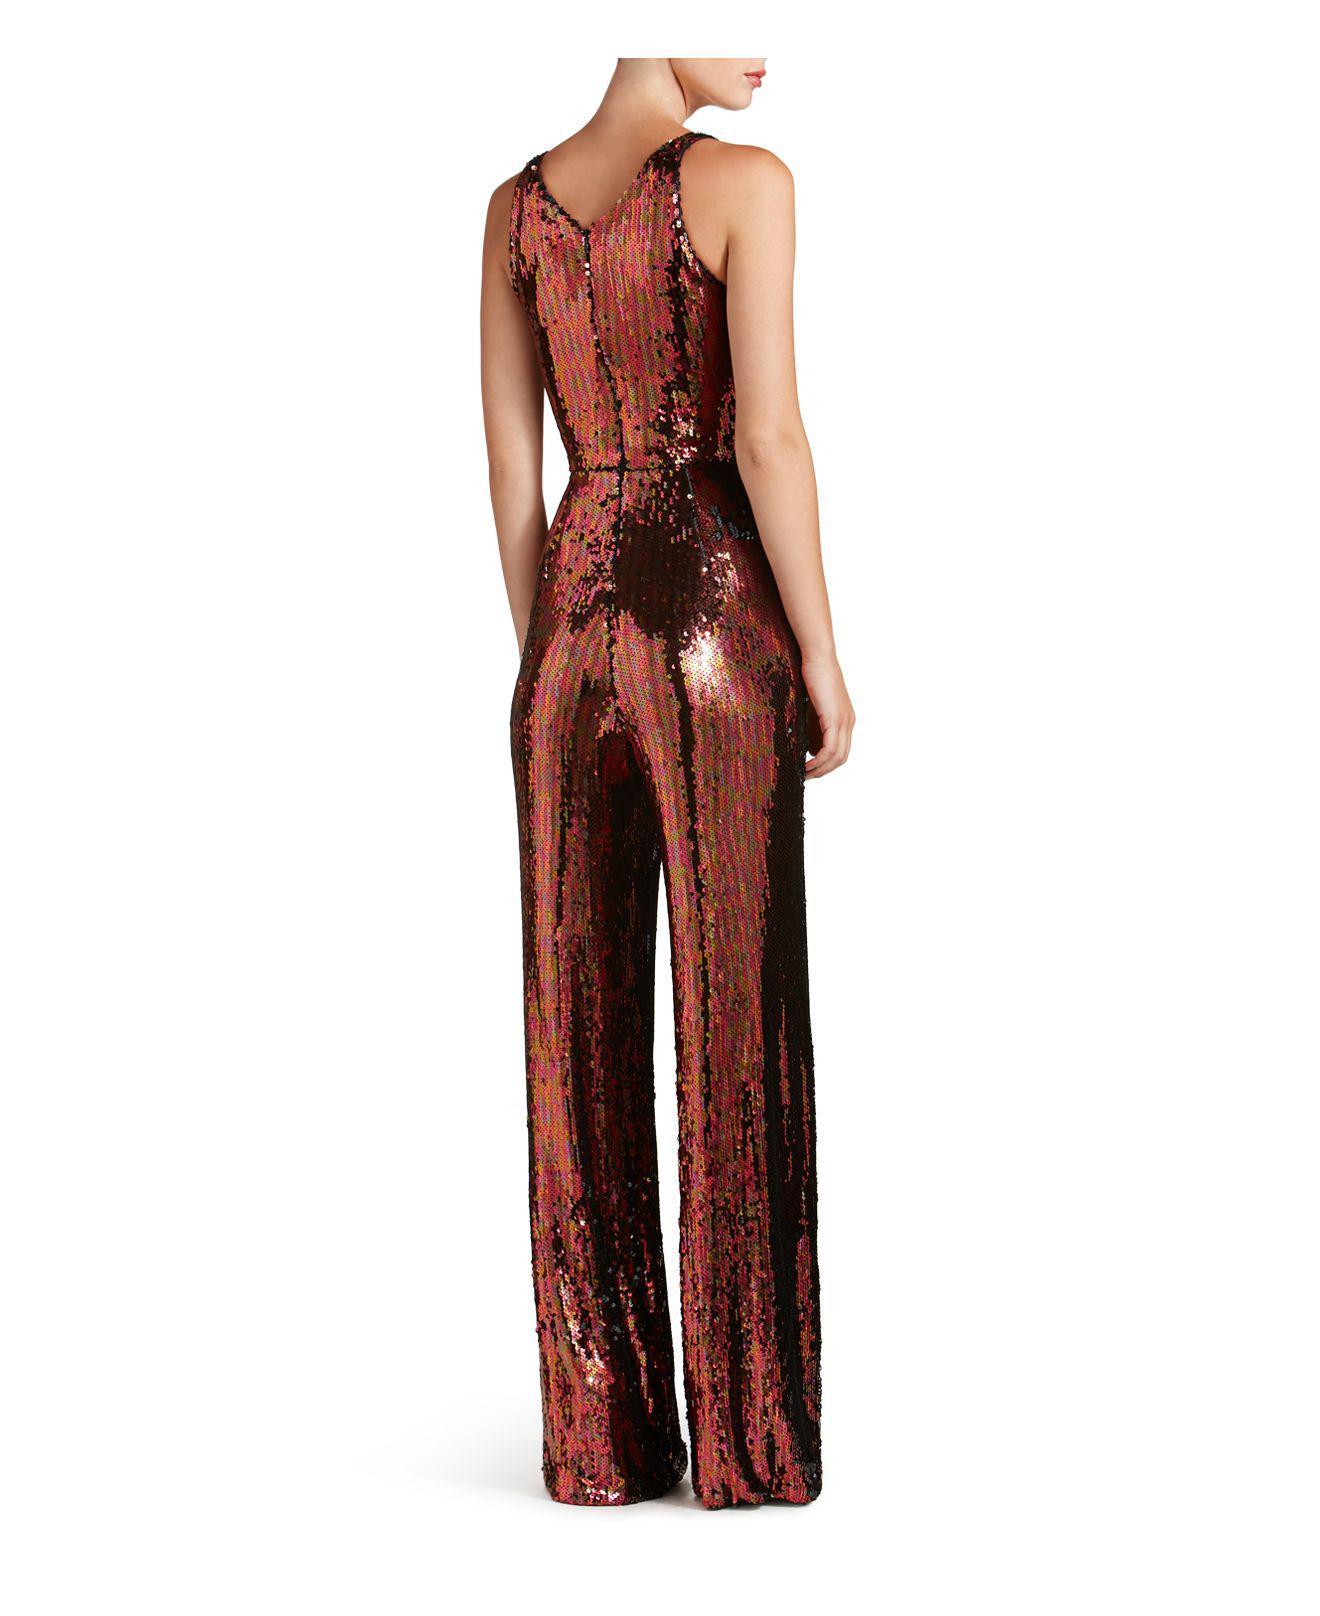 41a1bc40655 Lyst - Dress the Population Charlie Sequin Jumpsuit